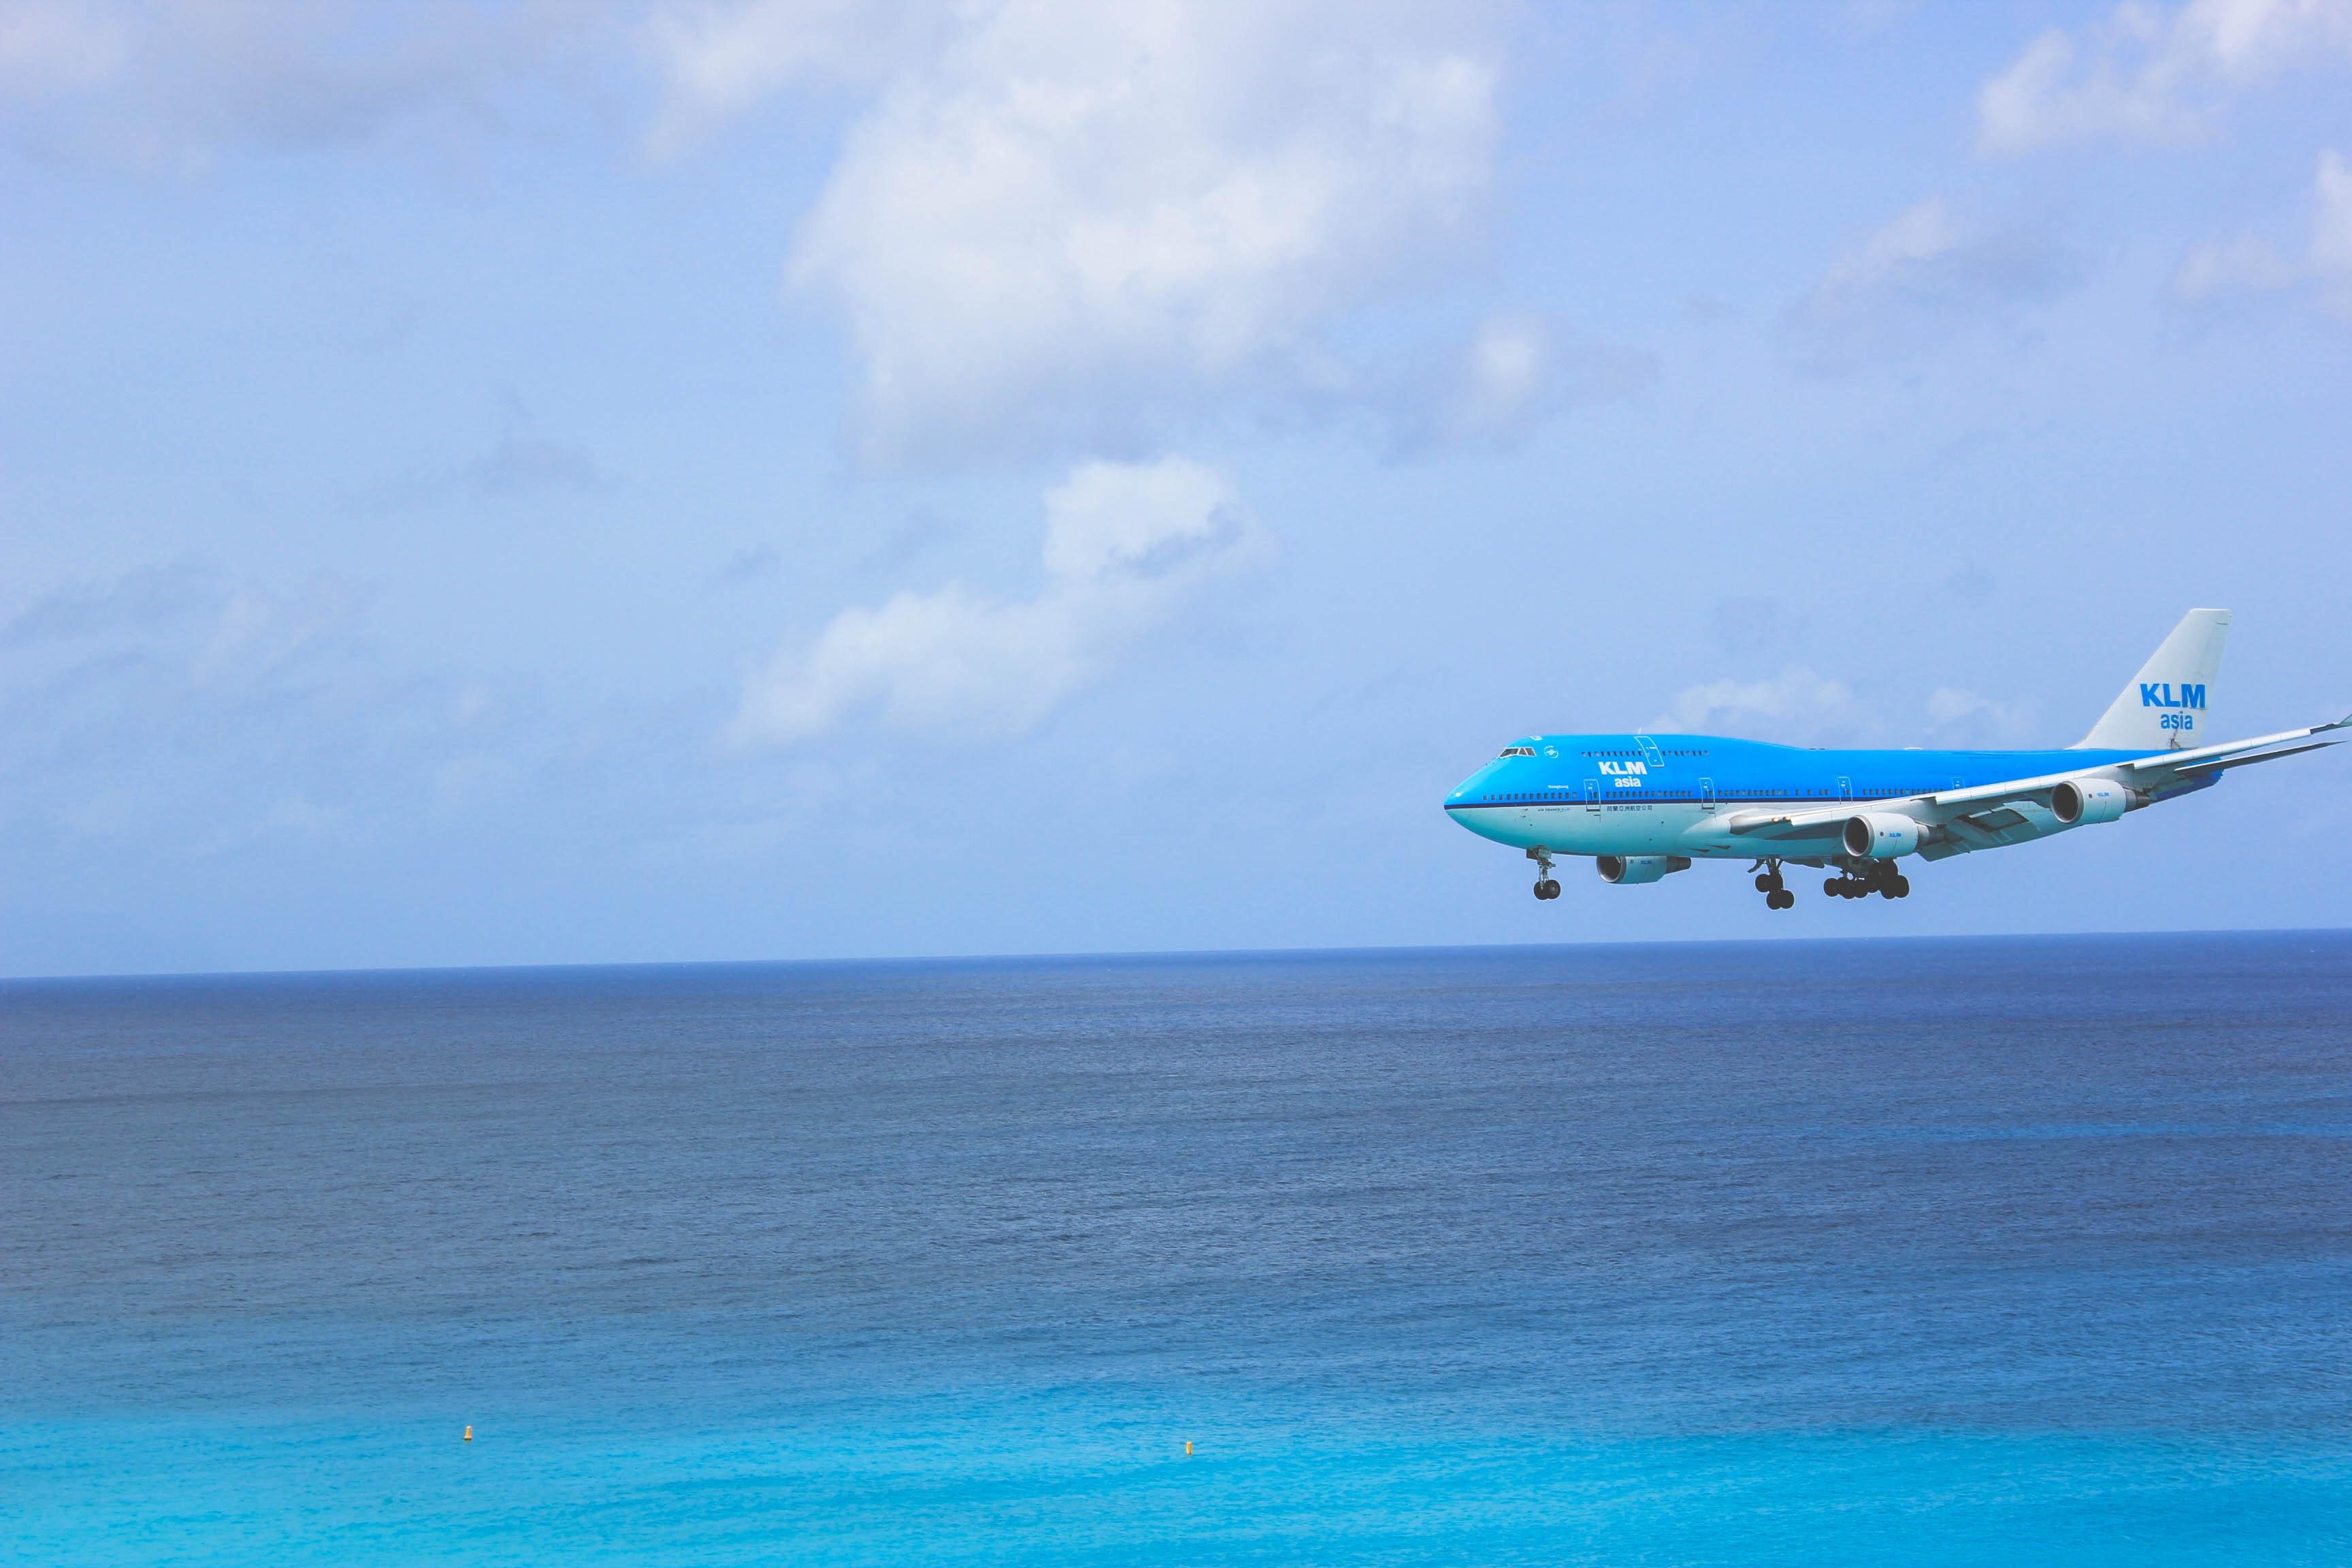 White and Blue Passenger Plane, Air travel, Ocean, Vacation, Tropical, HQ Photo